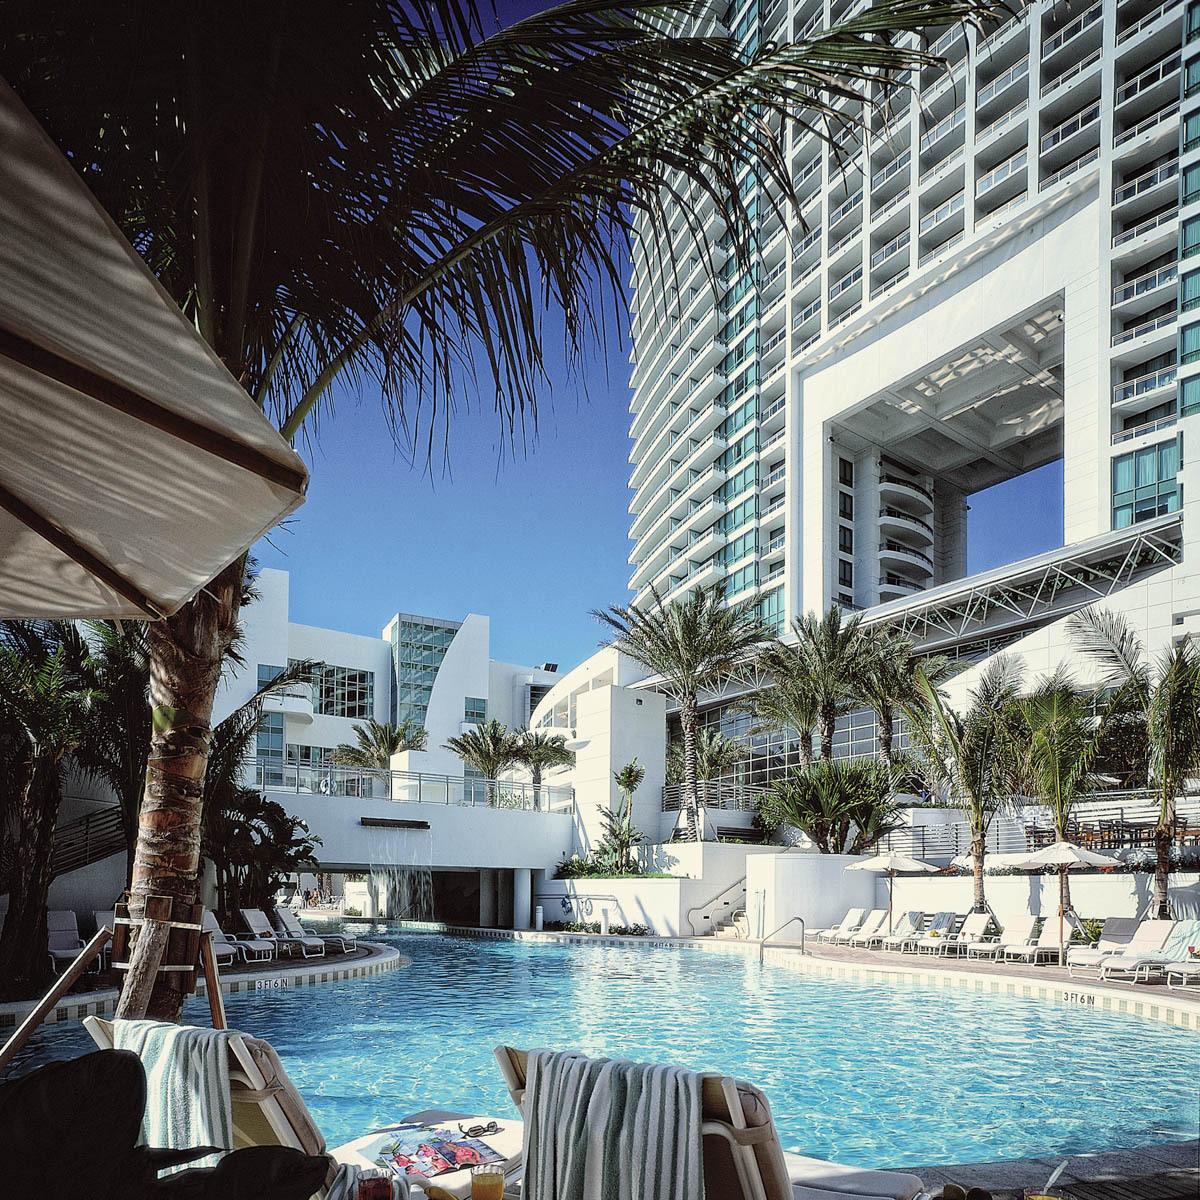 Westin diplomat resort convention center nbww for Design hotel hollywood florida